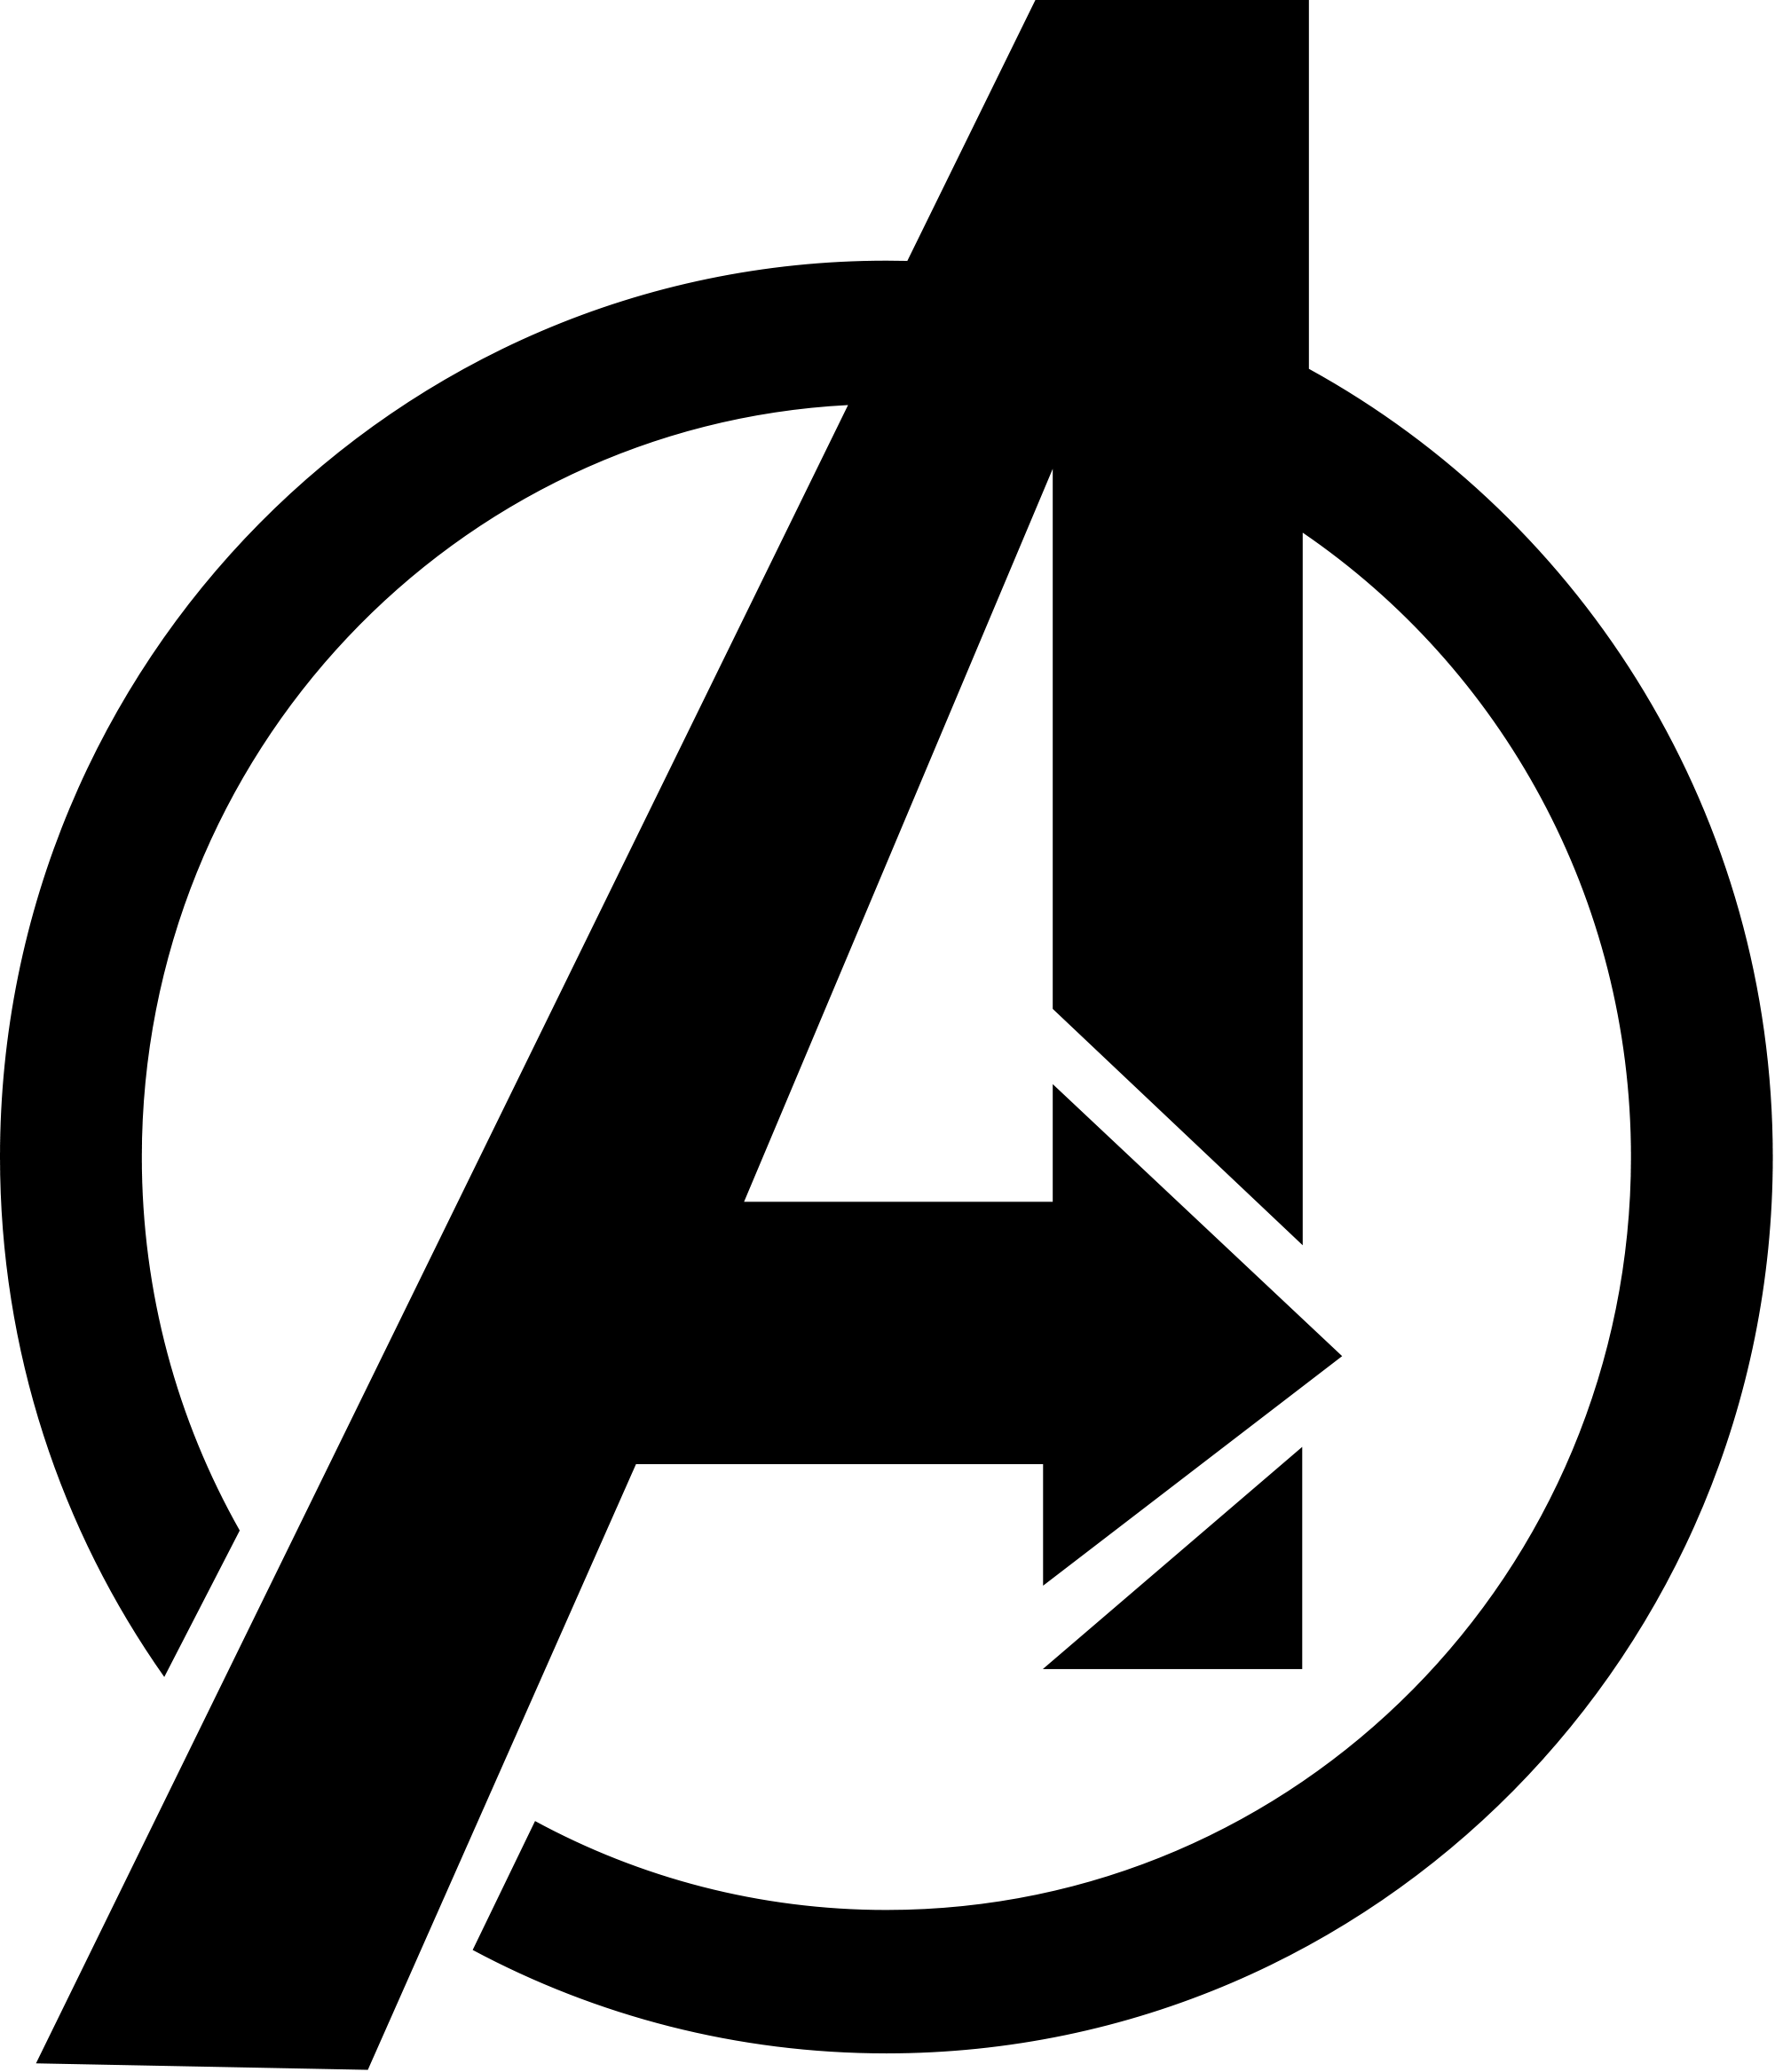 jpg transparent stock Avengers svg. File symbol from marvel